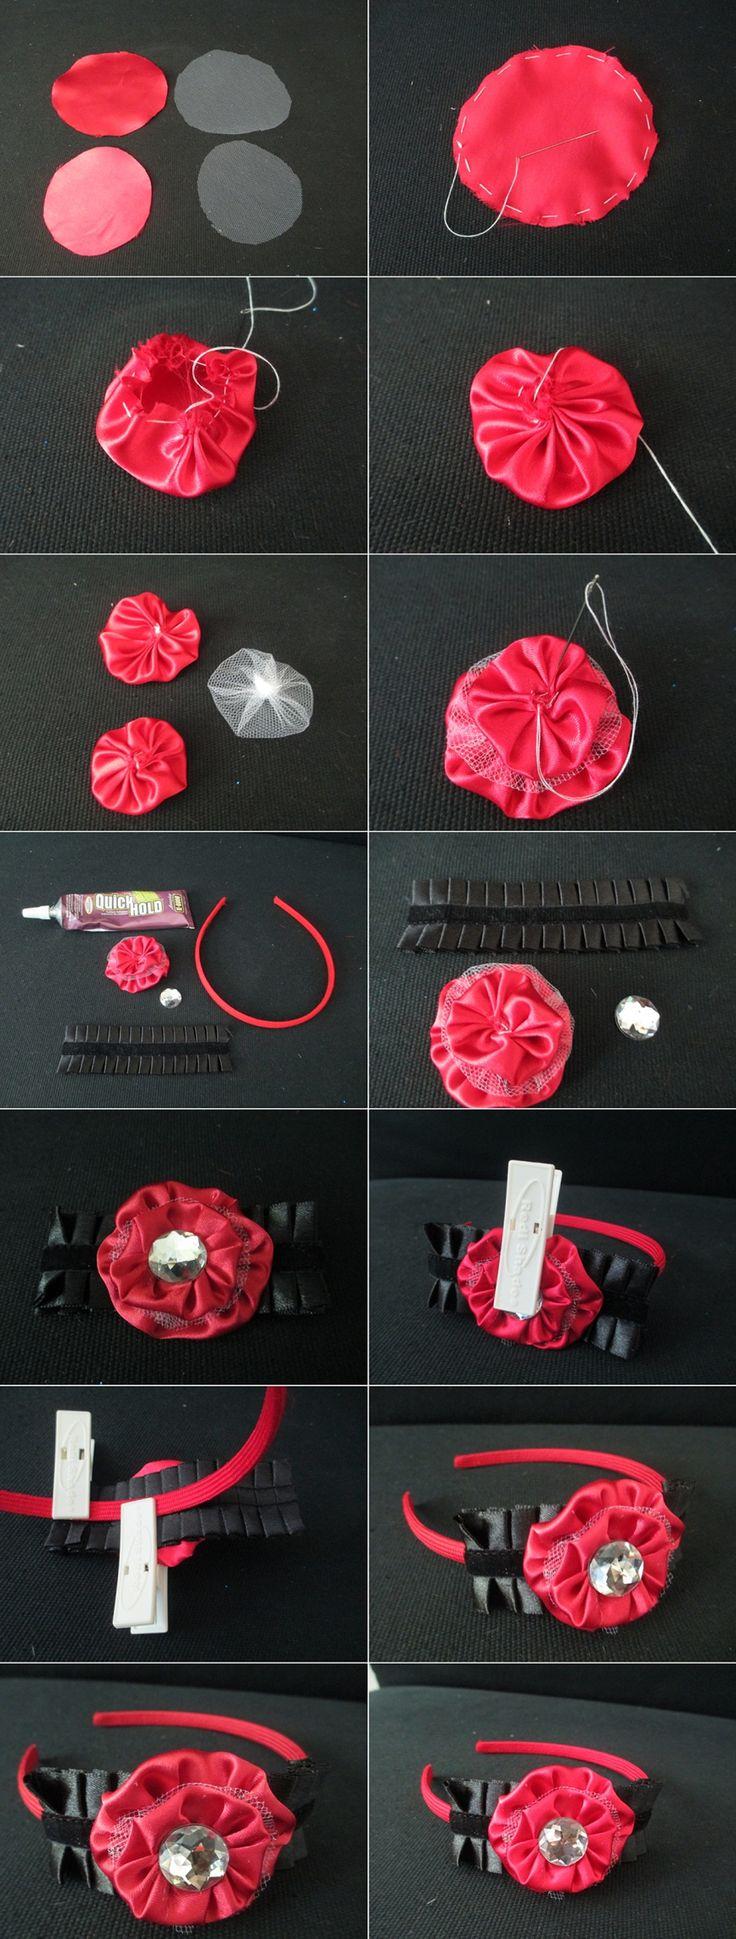 Fabric Yo-Yo Flower Headband with Decorative Fabric Ribbon